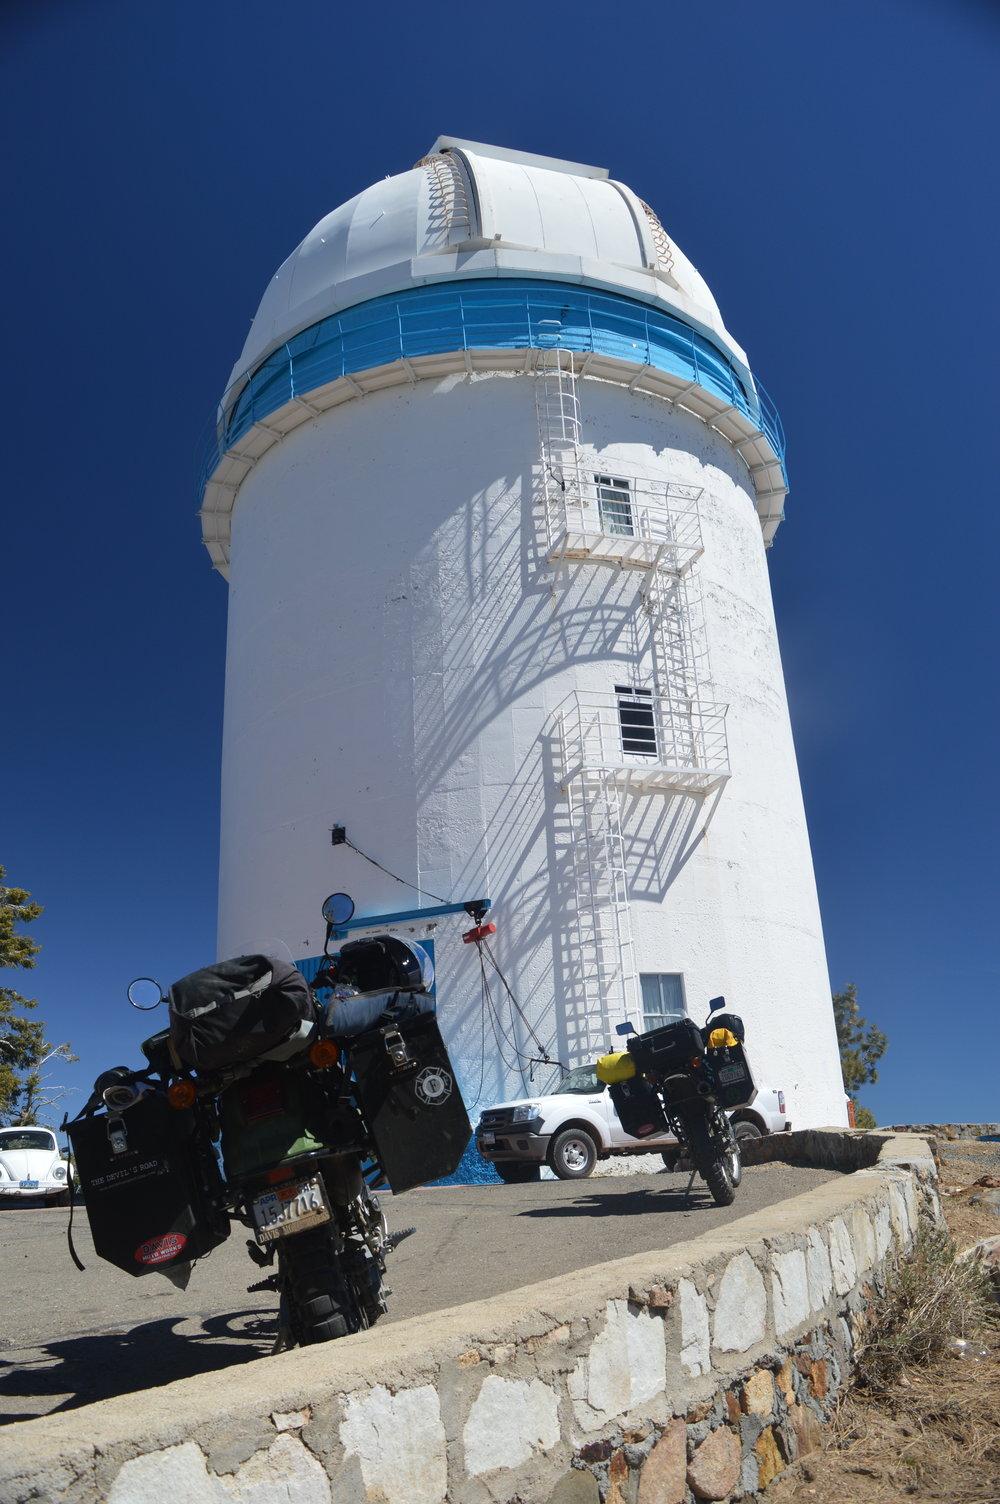 Sierra San Pedro Martir Observatory